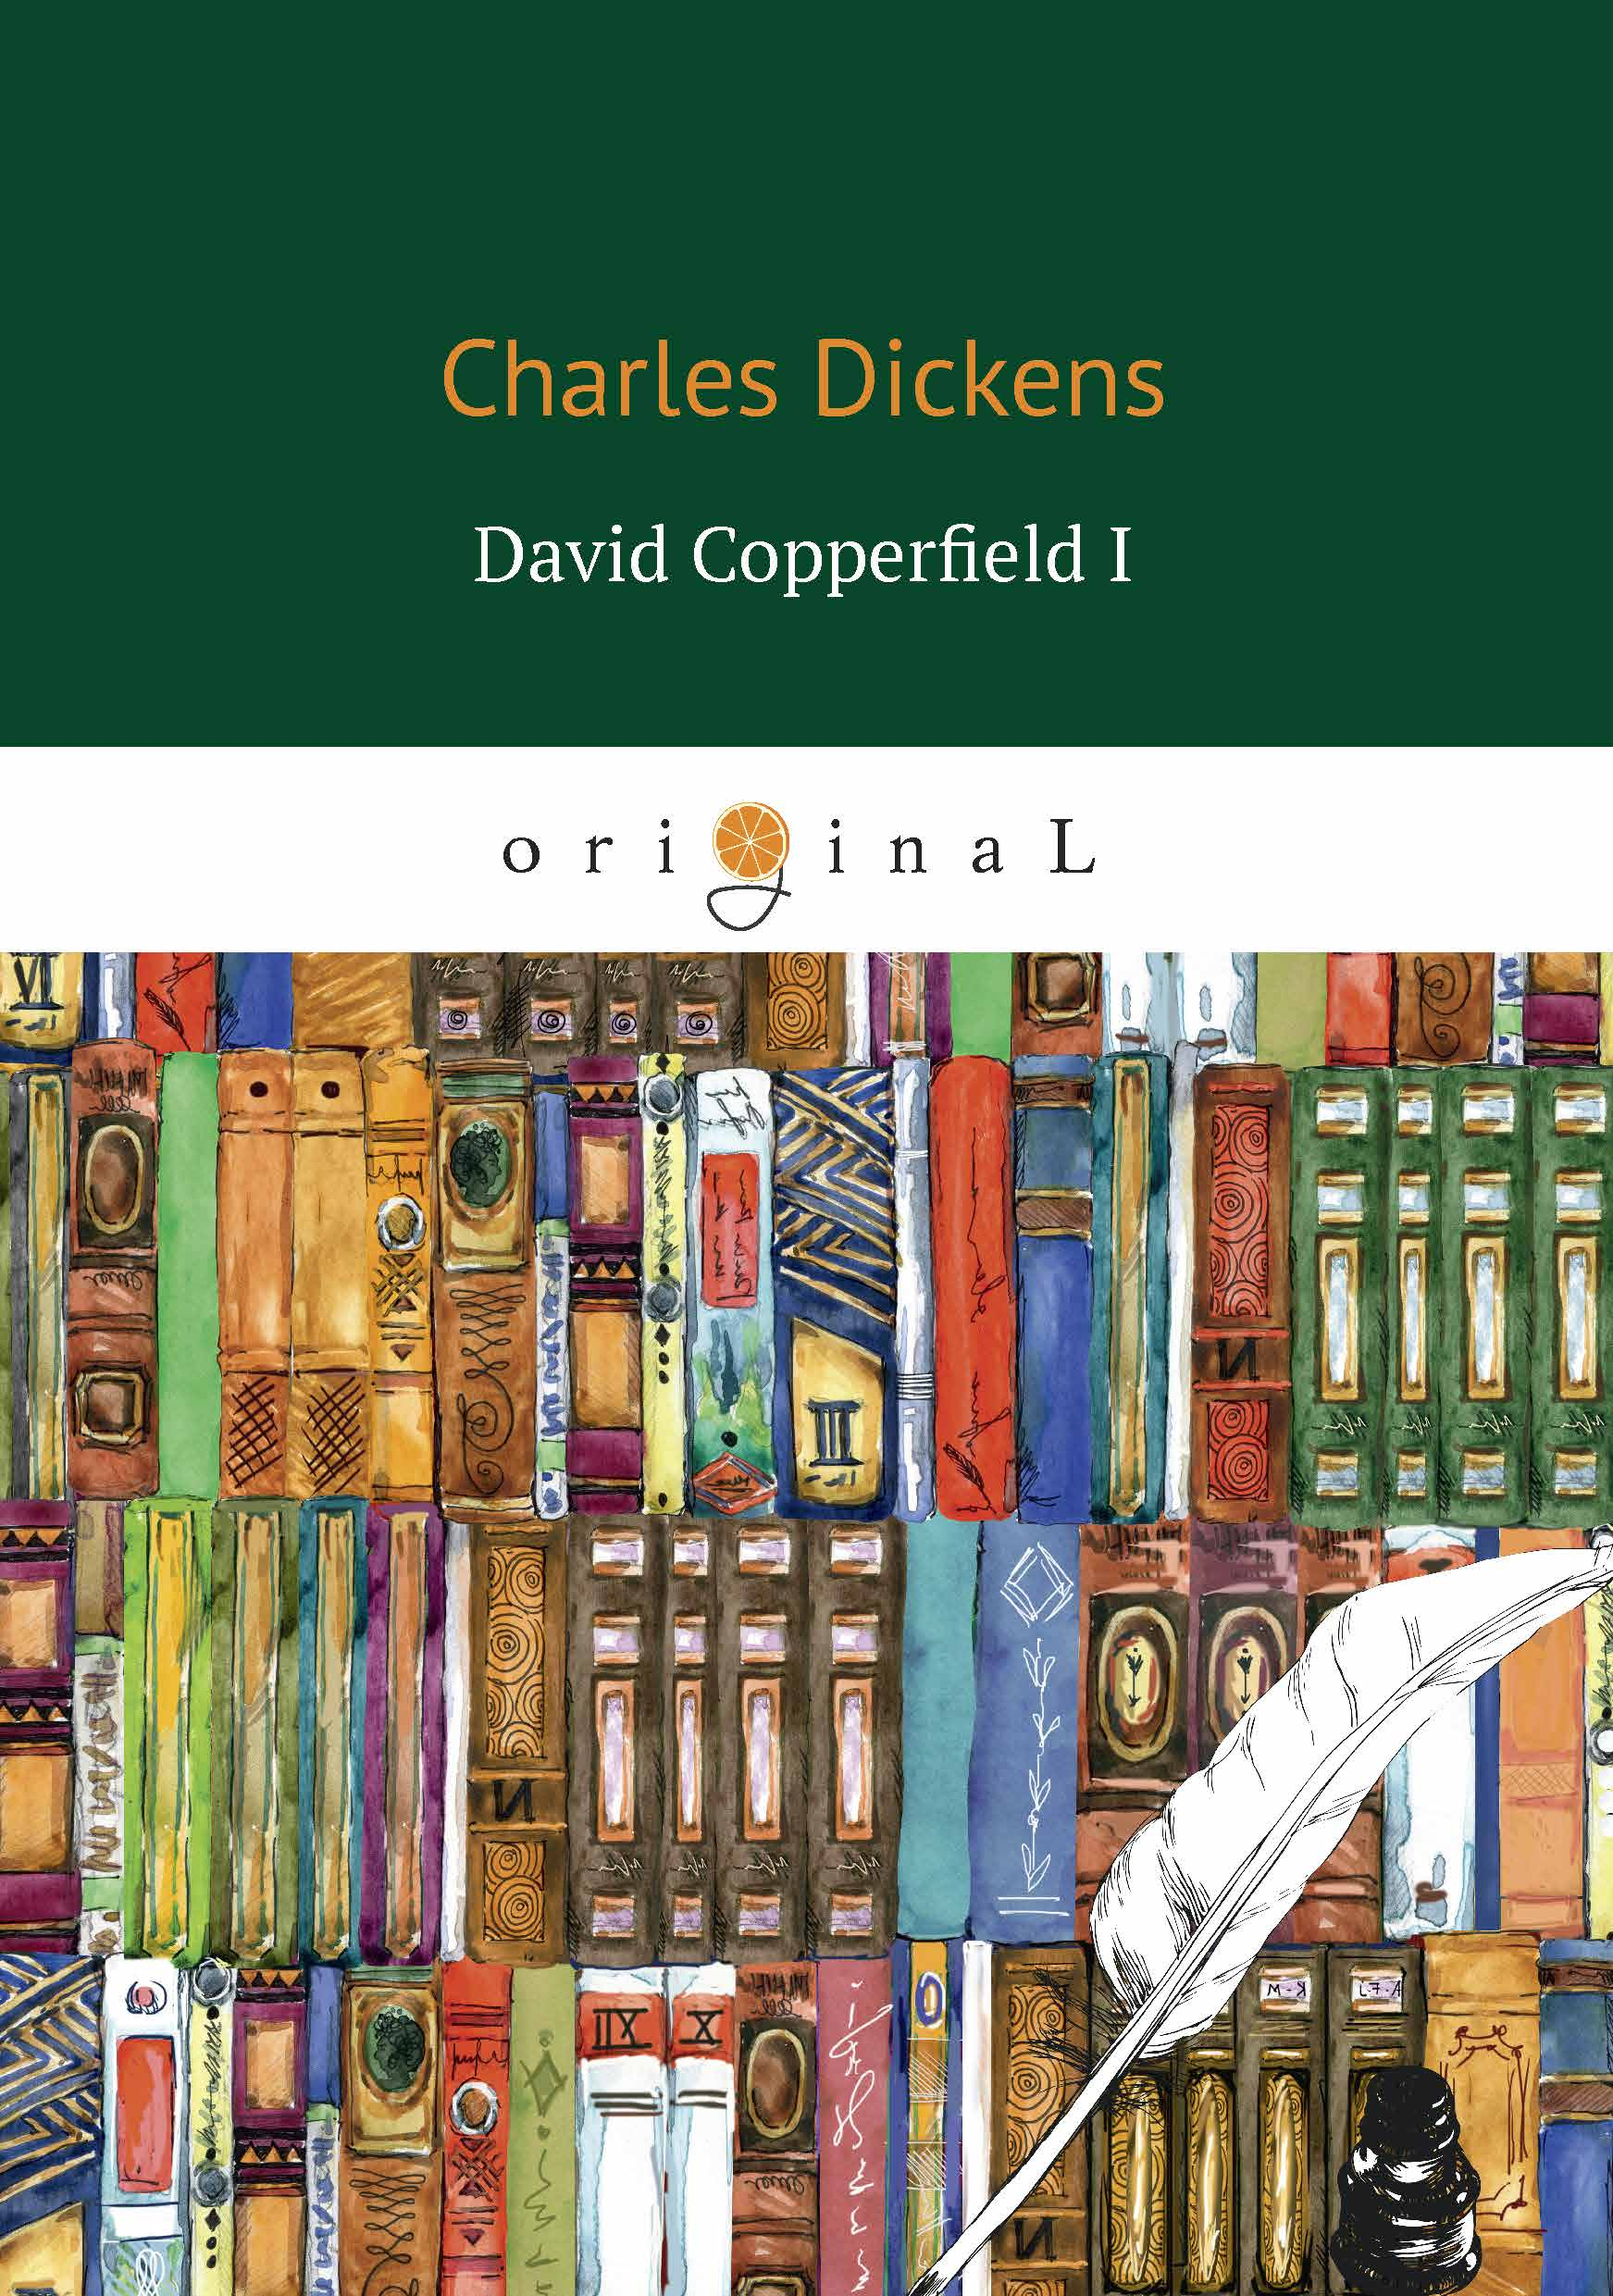 Dickens C. David Copperfield I